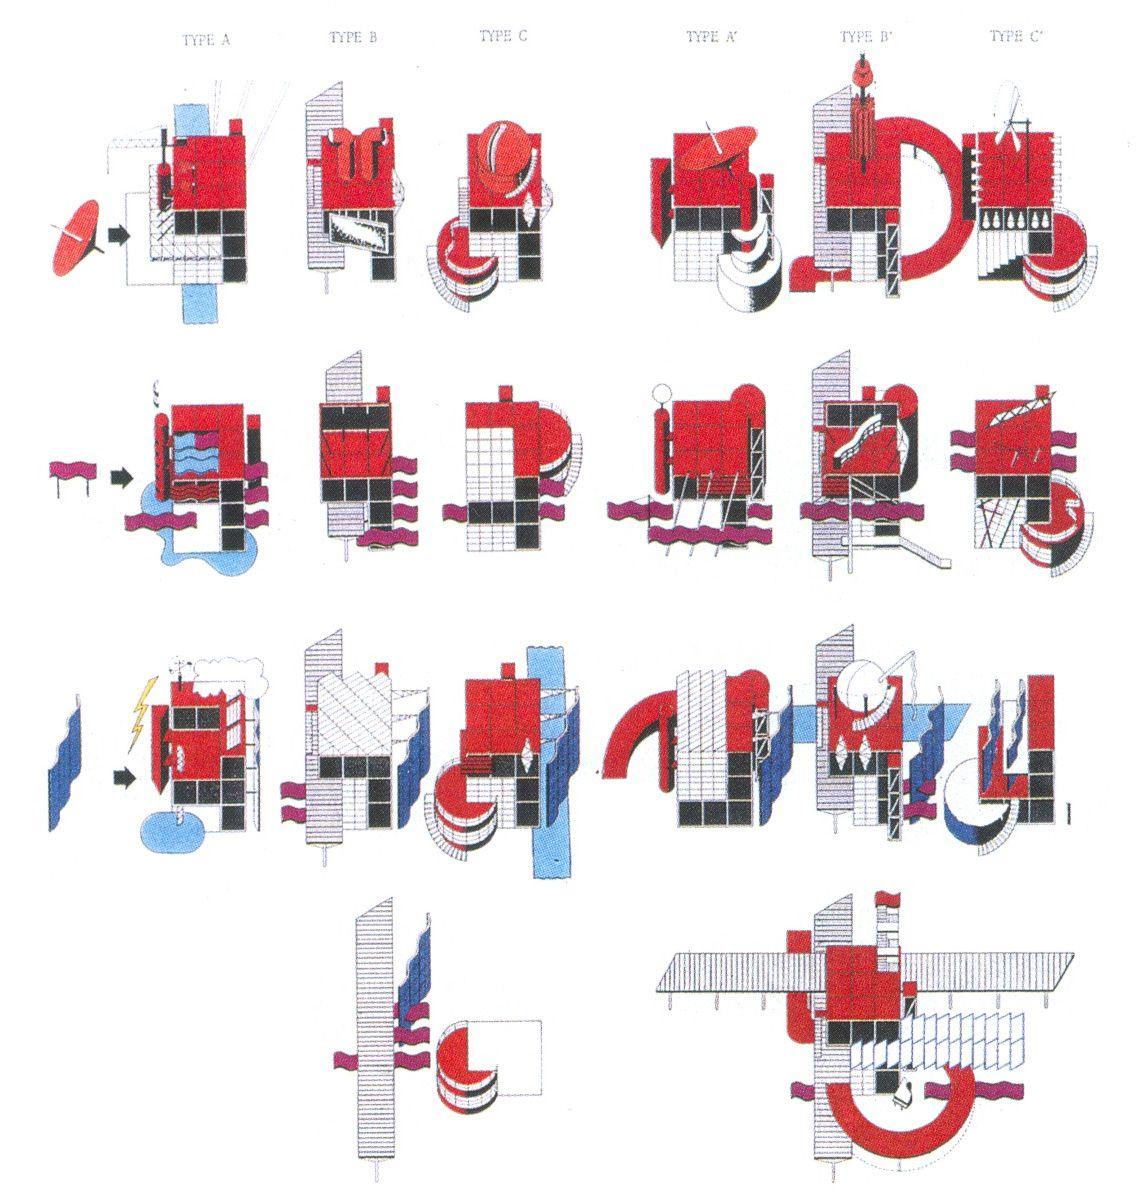 Oma Parc De La Villette Diagram 2005 Honda Accord Lx Radio Wiring Bernard Tschumi Architects Folie Matrix